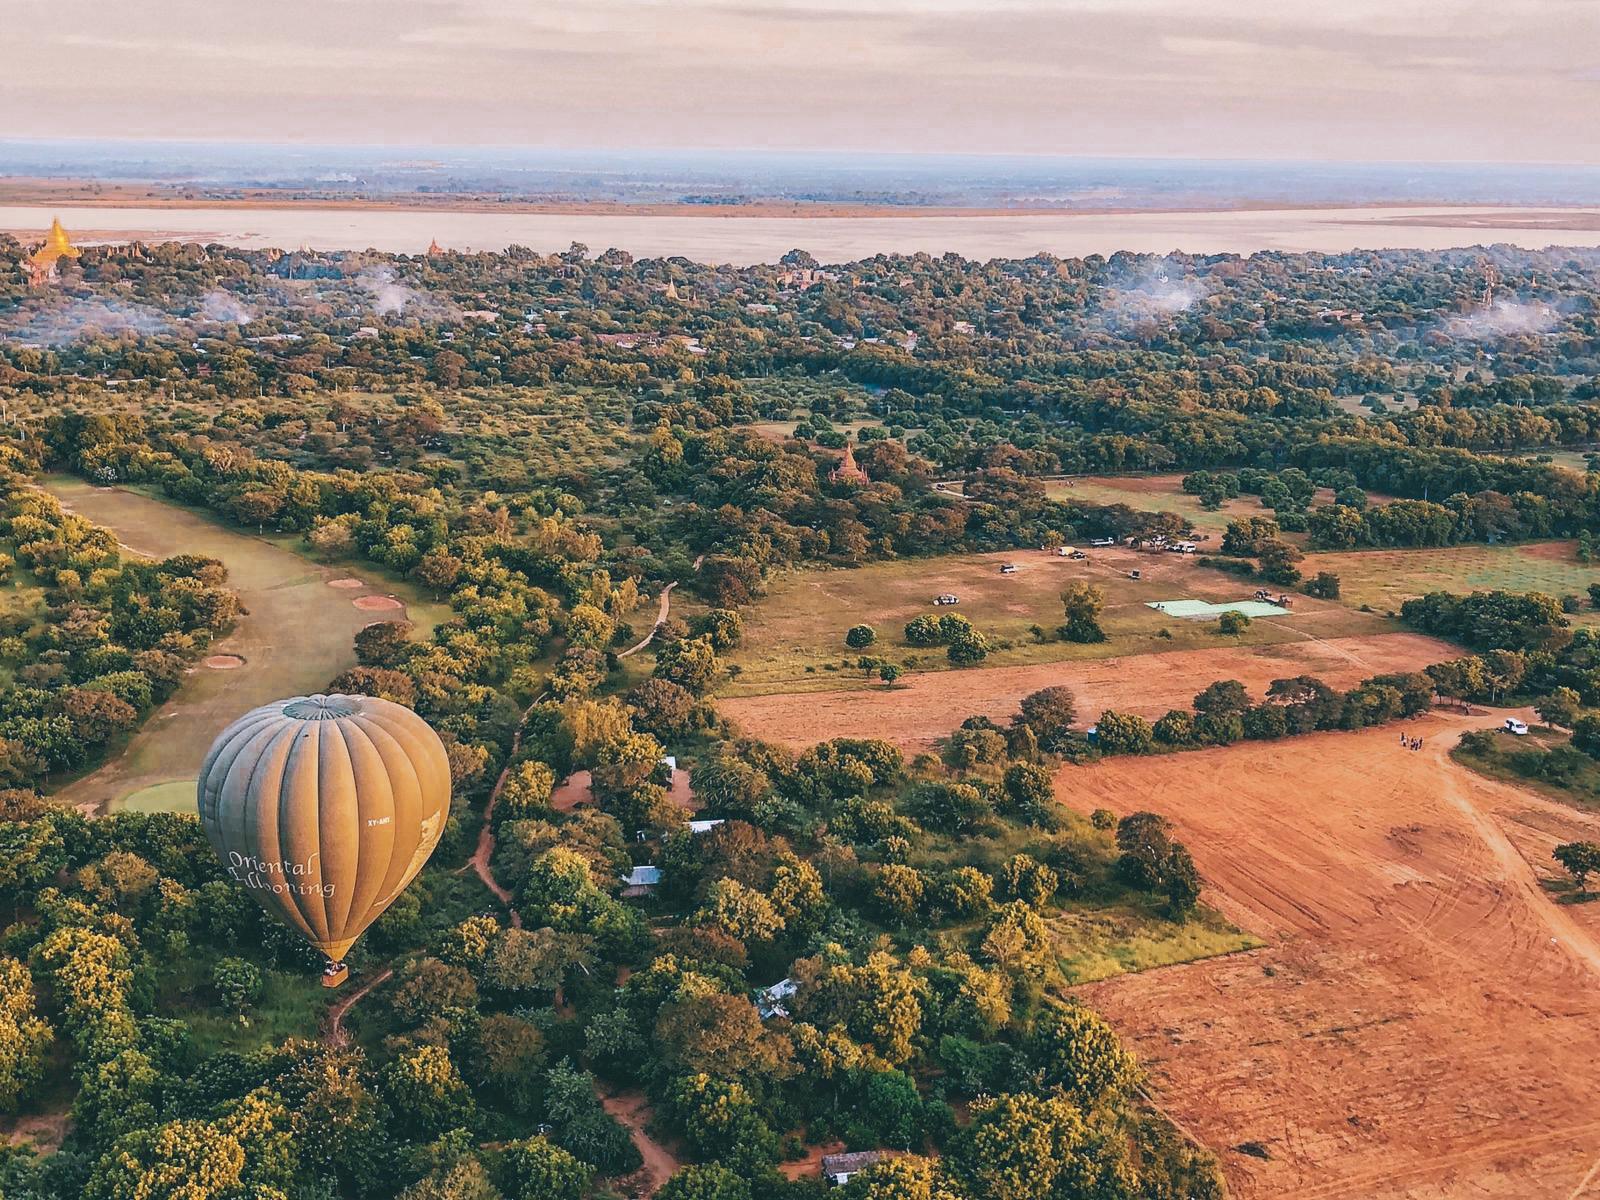 Bird's Eye View - Oriental Ballooning